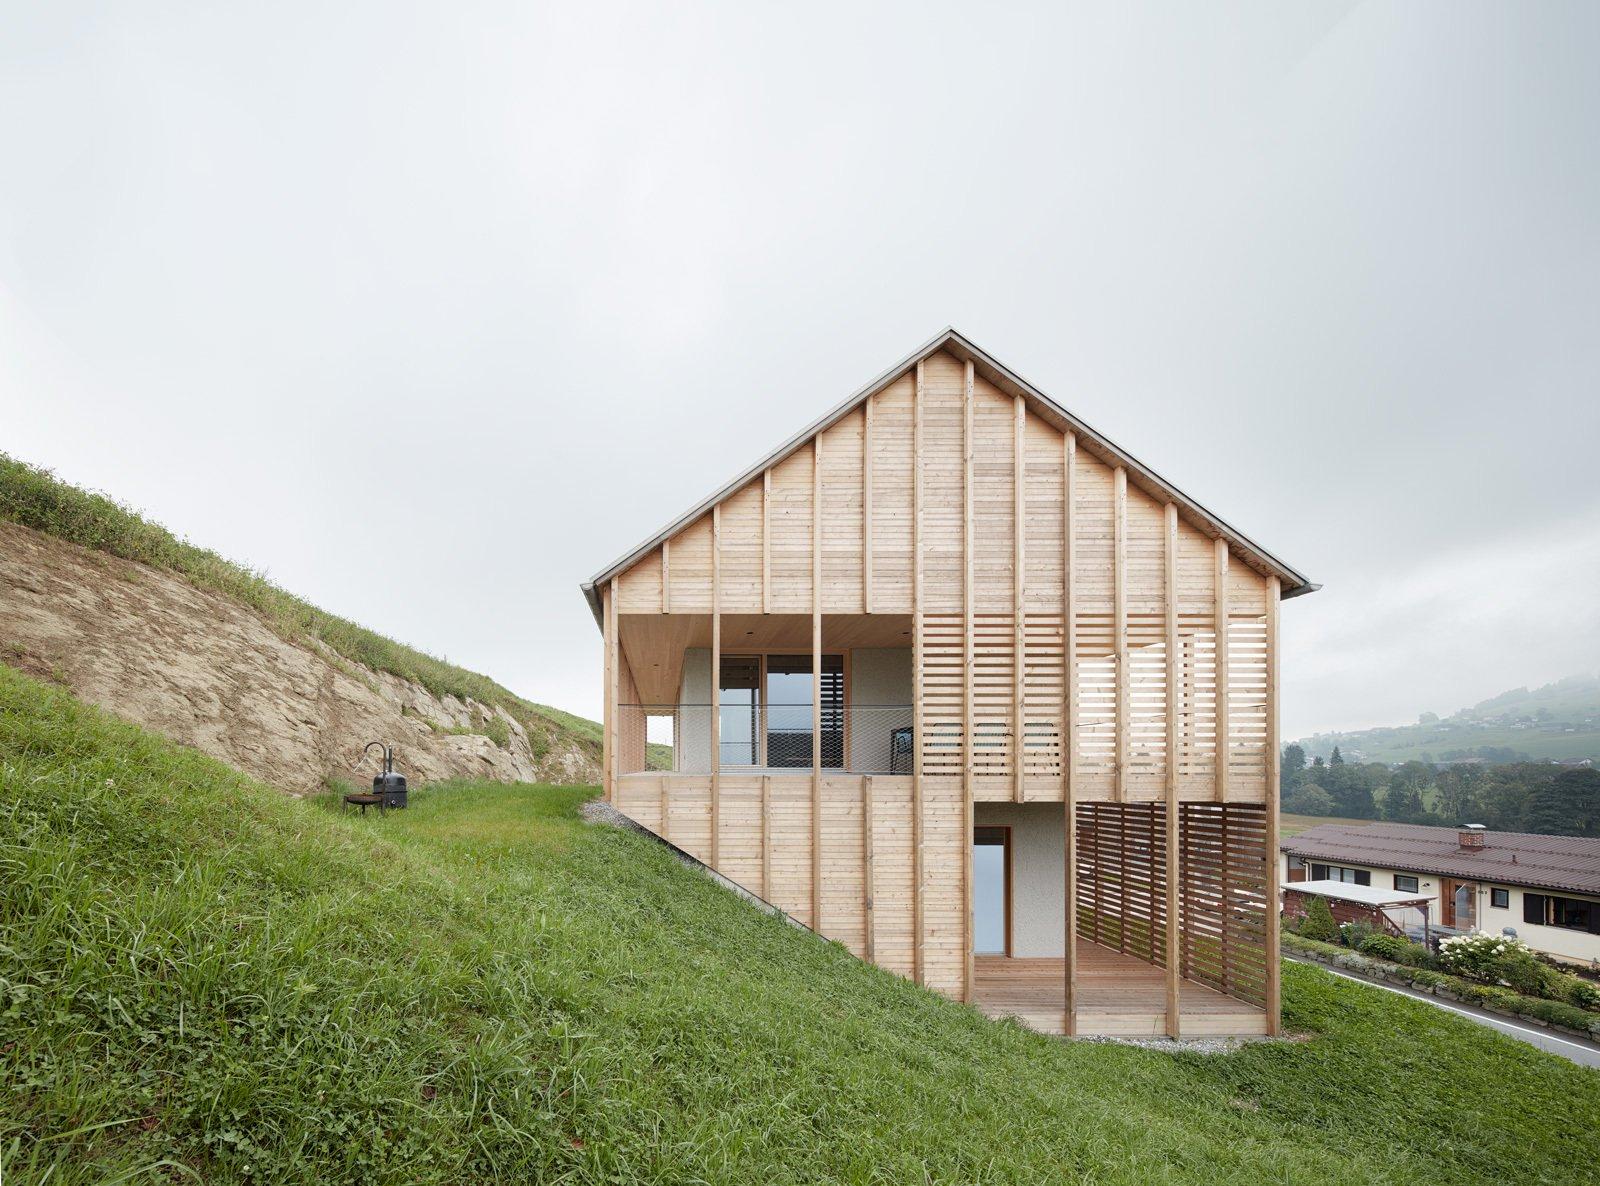 Best Kitchen Gallery: A Minimalist Home Is Built Into Steep Terrain In An Austrian Valley of Modern Home Base Of Steep Hillside on rachelxblog.com